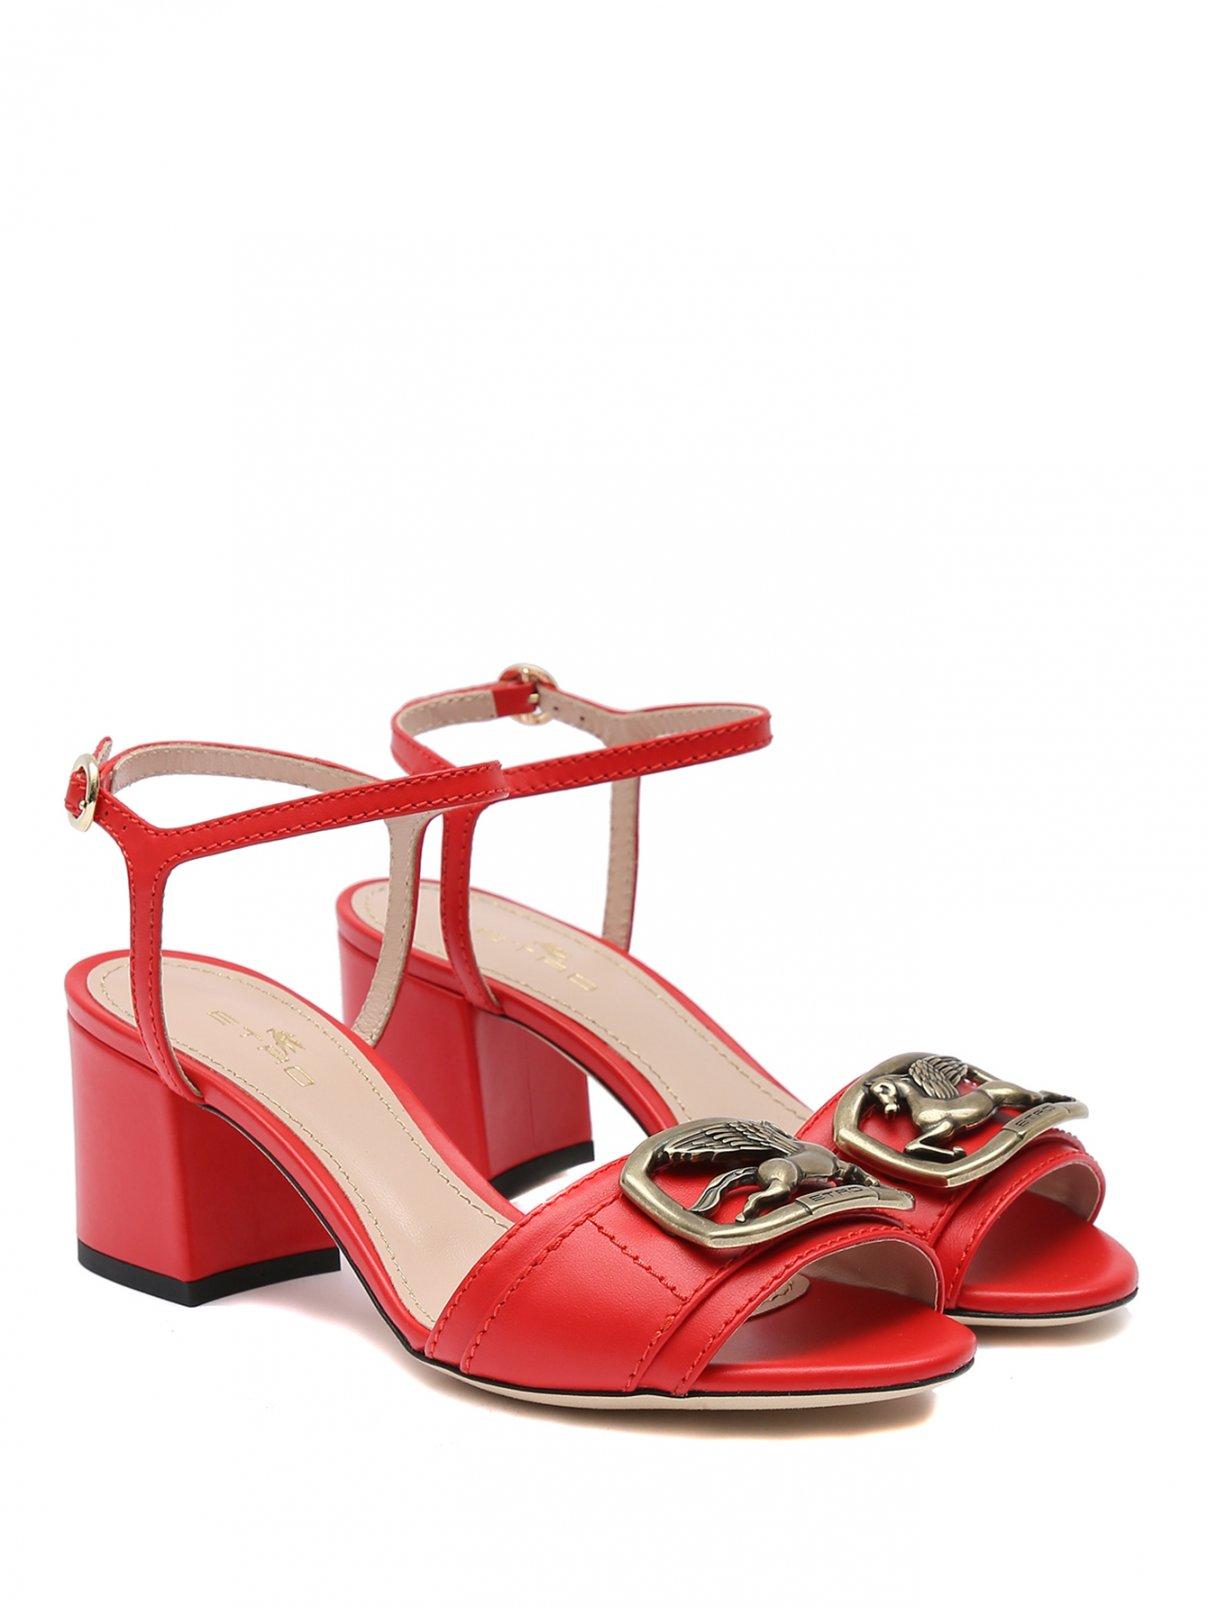 Босоножки из кожи на среднем каблуке Etro  –  Общий вид